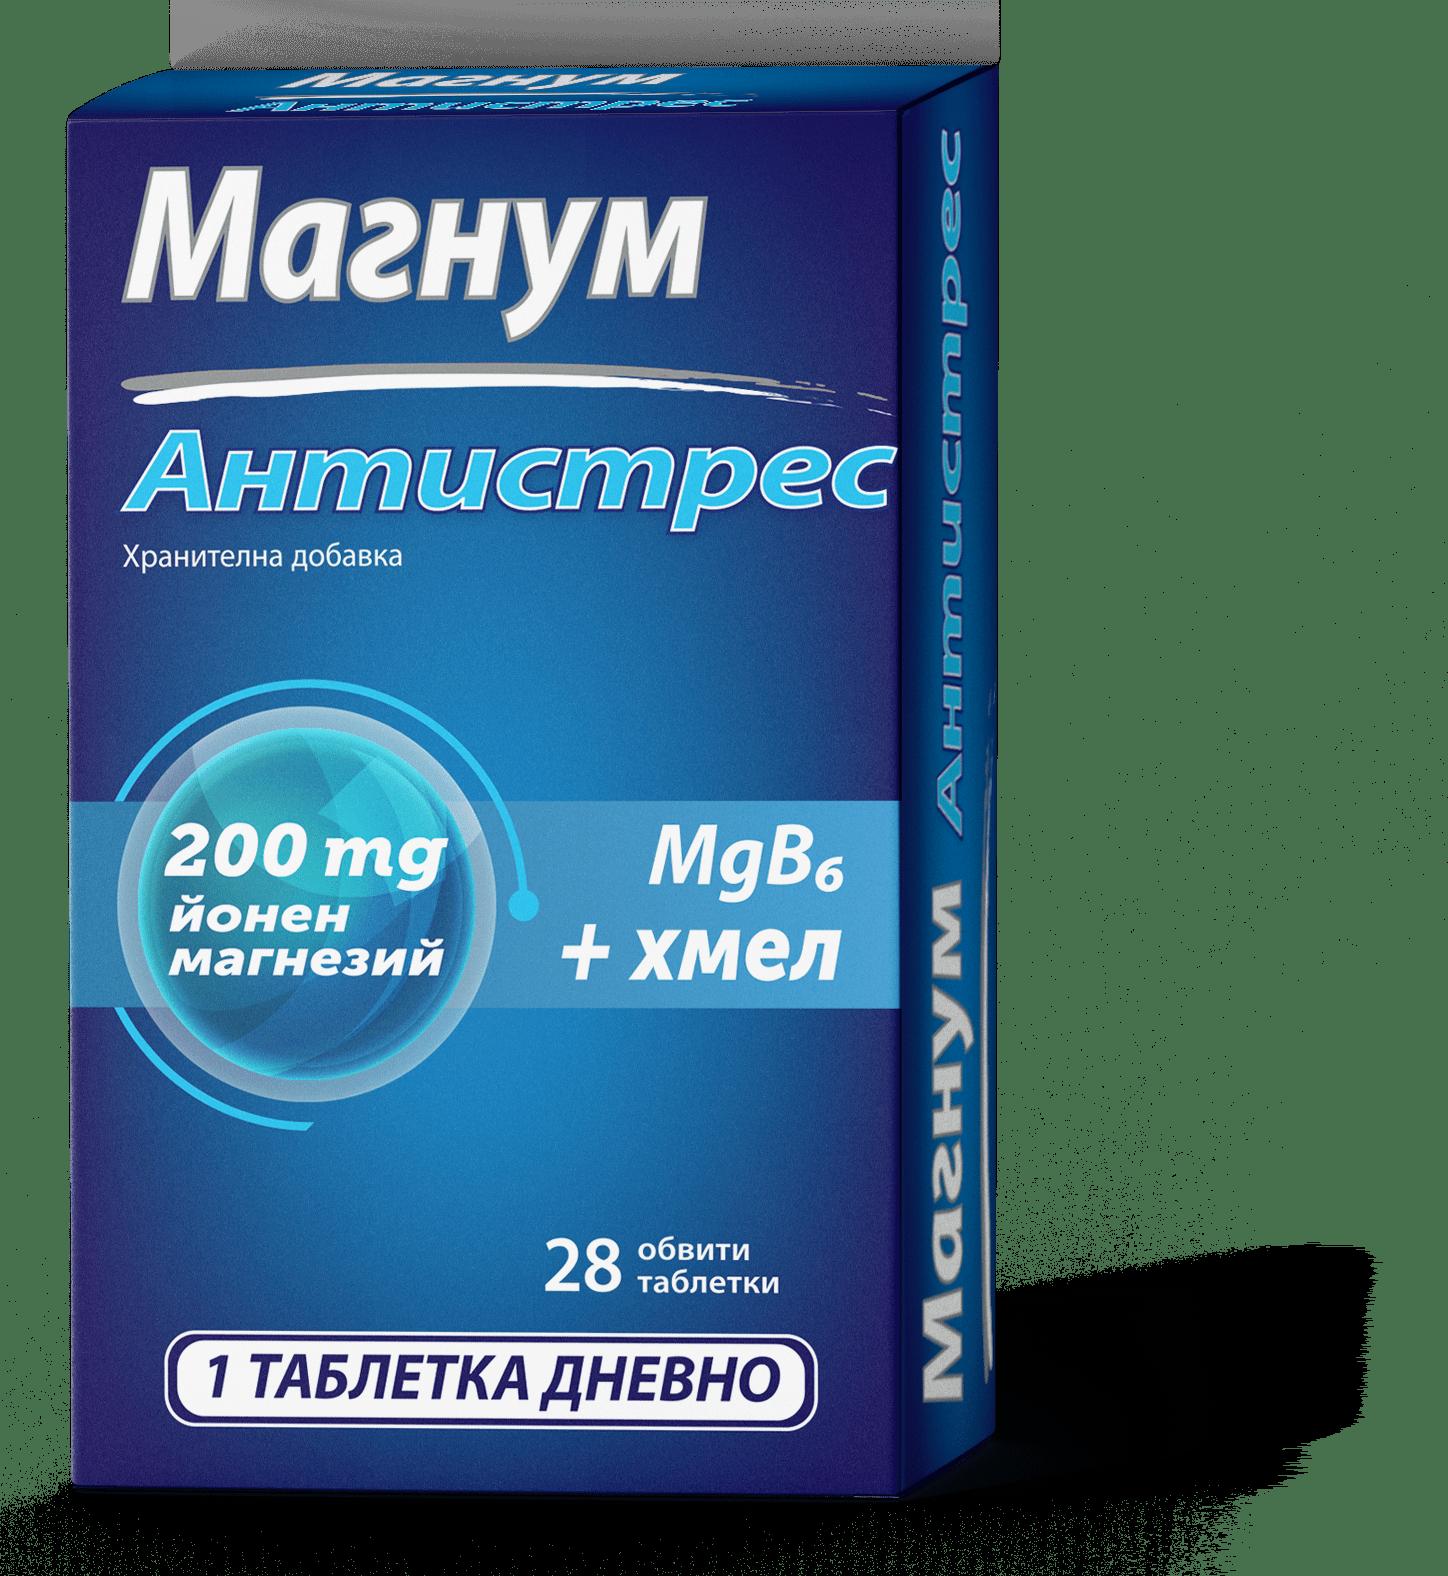 Magnum Antistress / Магнум антистрес